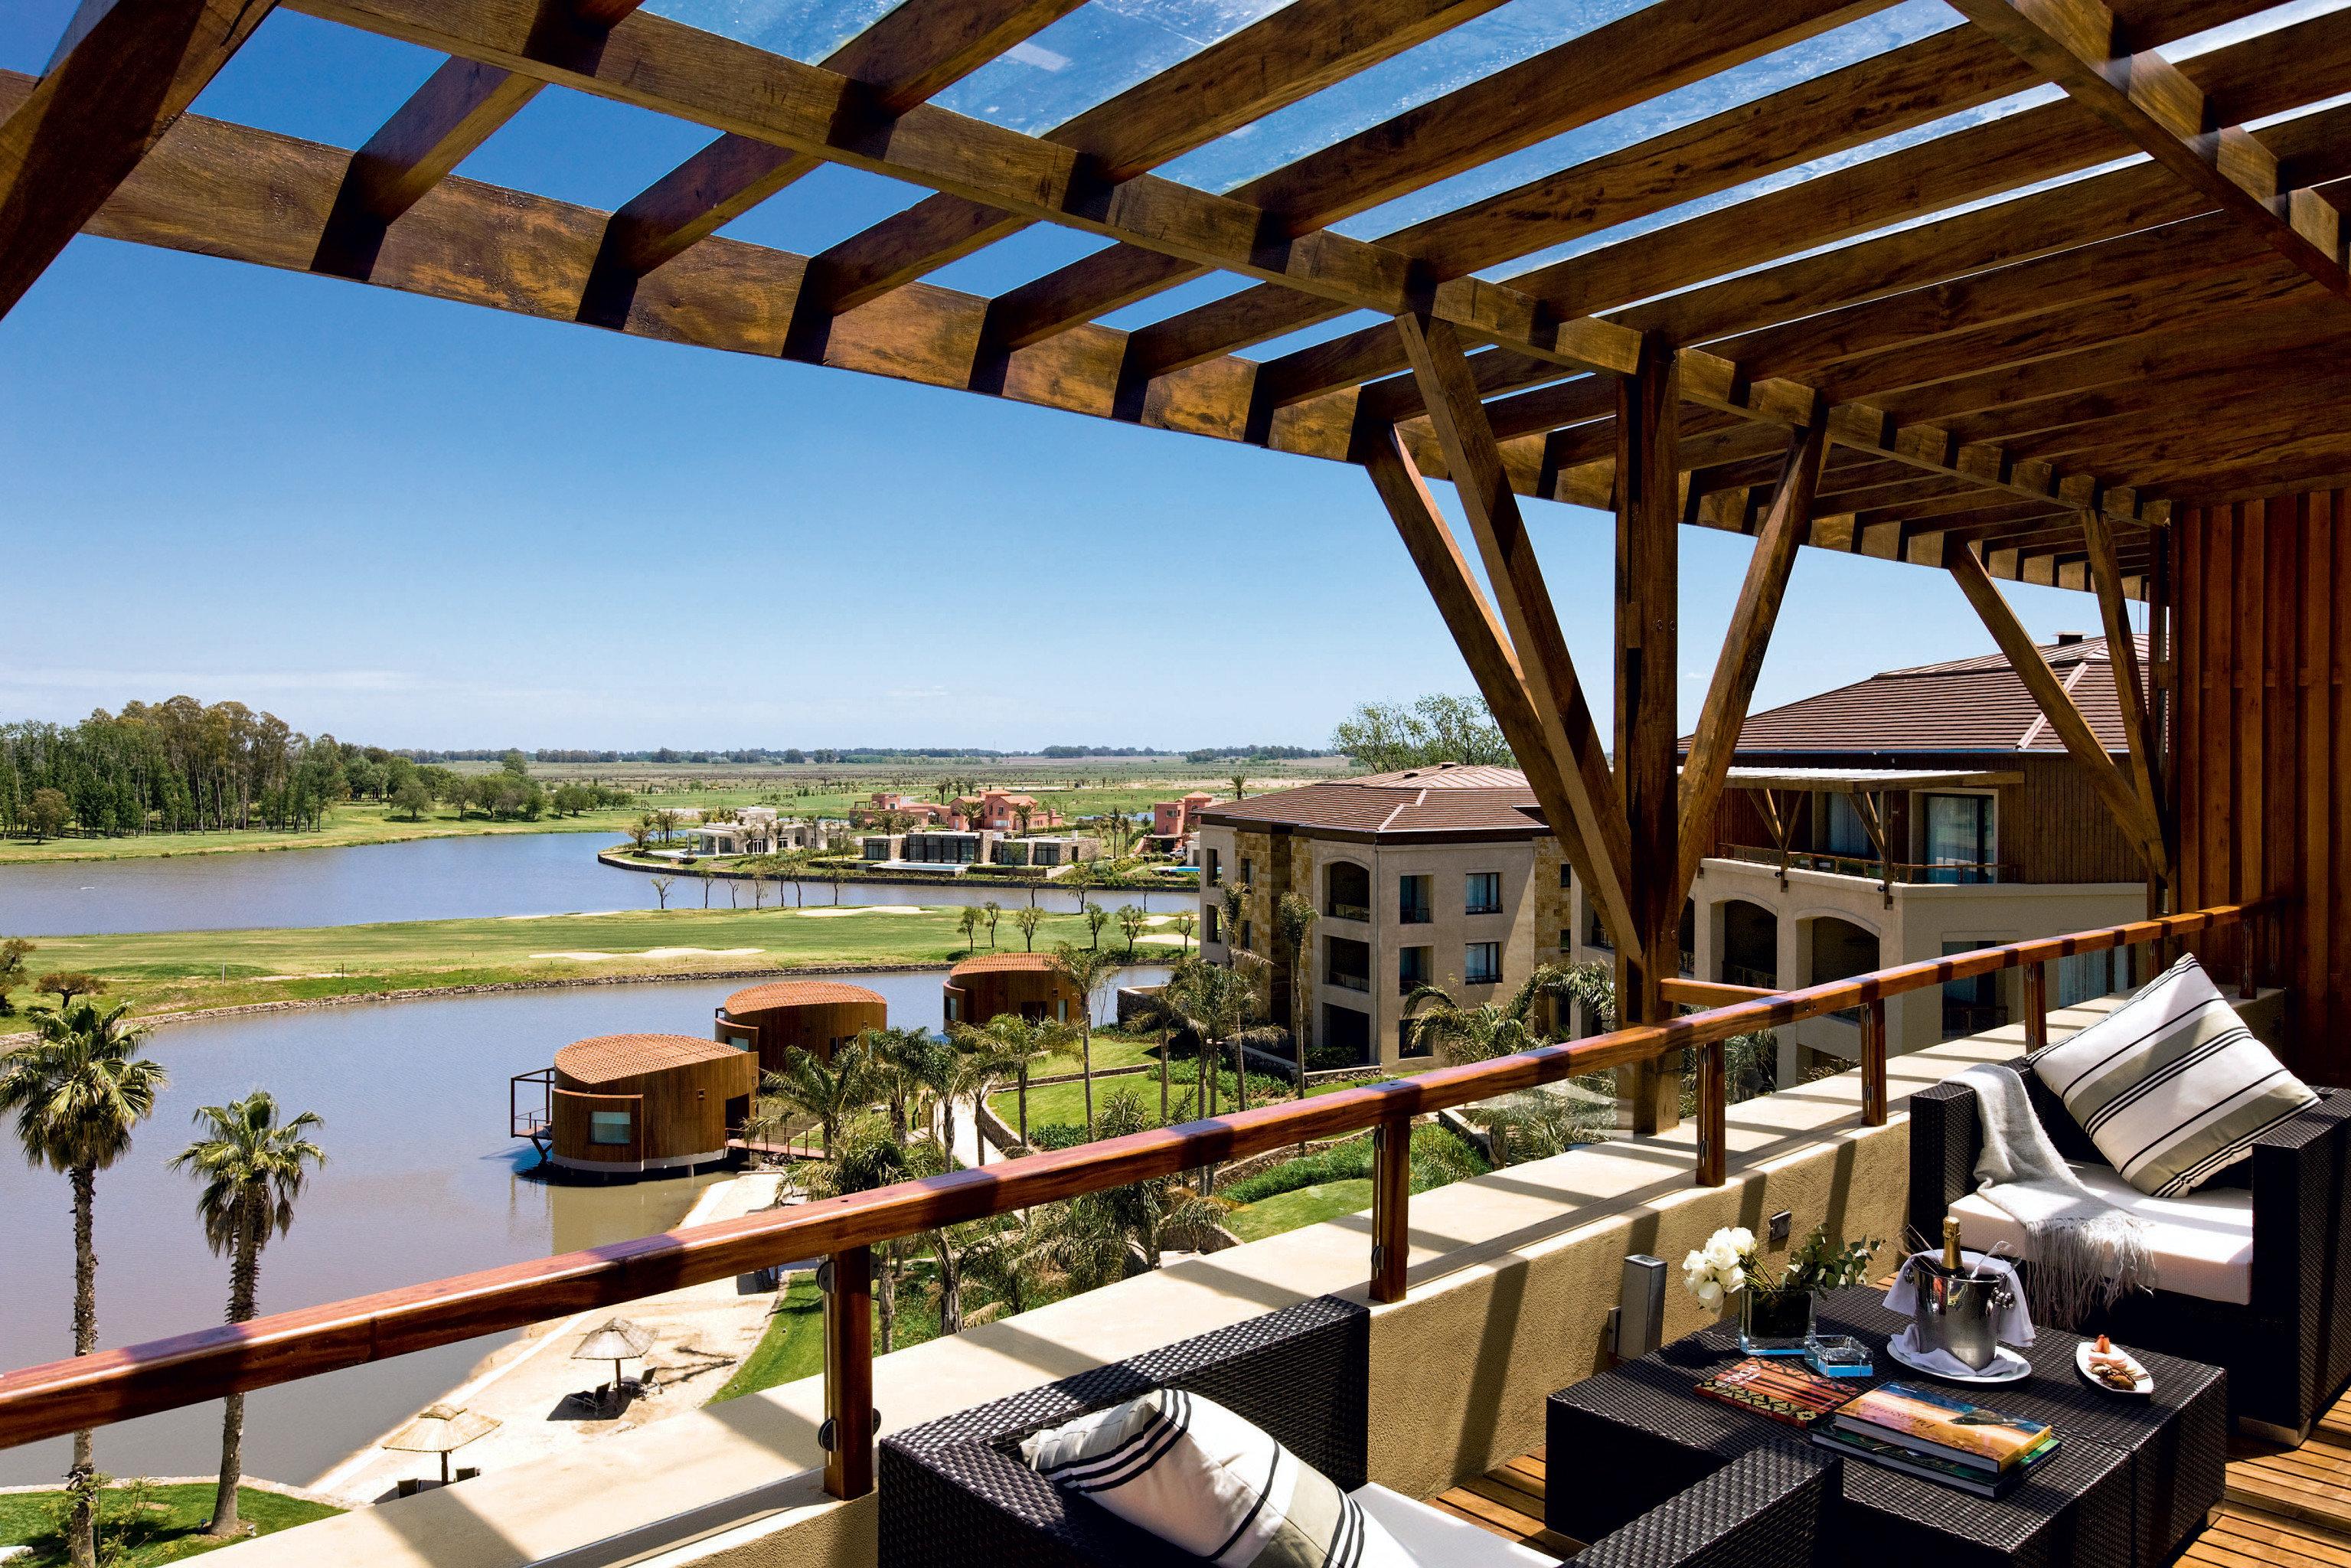 Balcony Exterior Grounds Lounge Patio Resort Romantic Terrace Waterfront overlooking